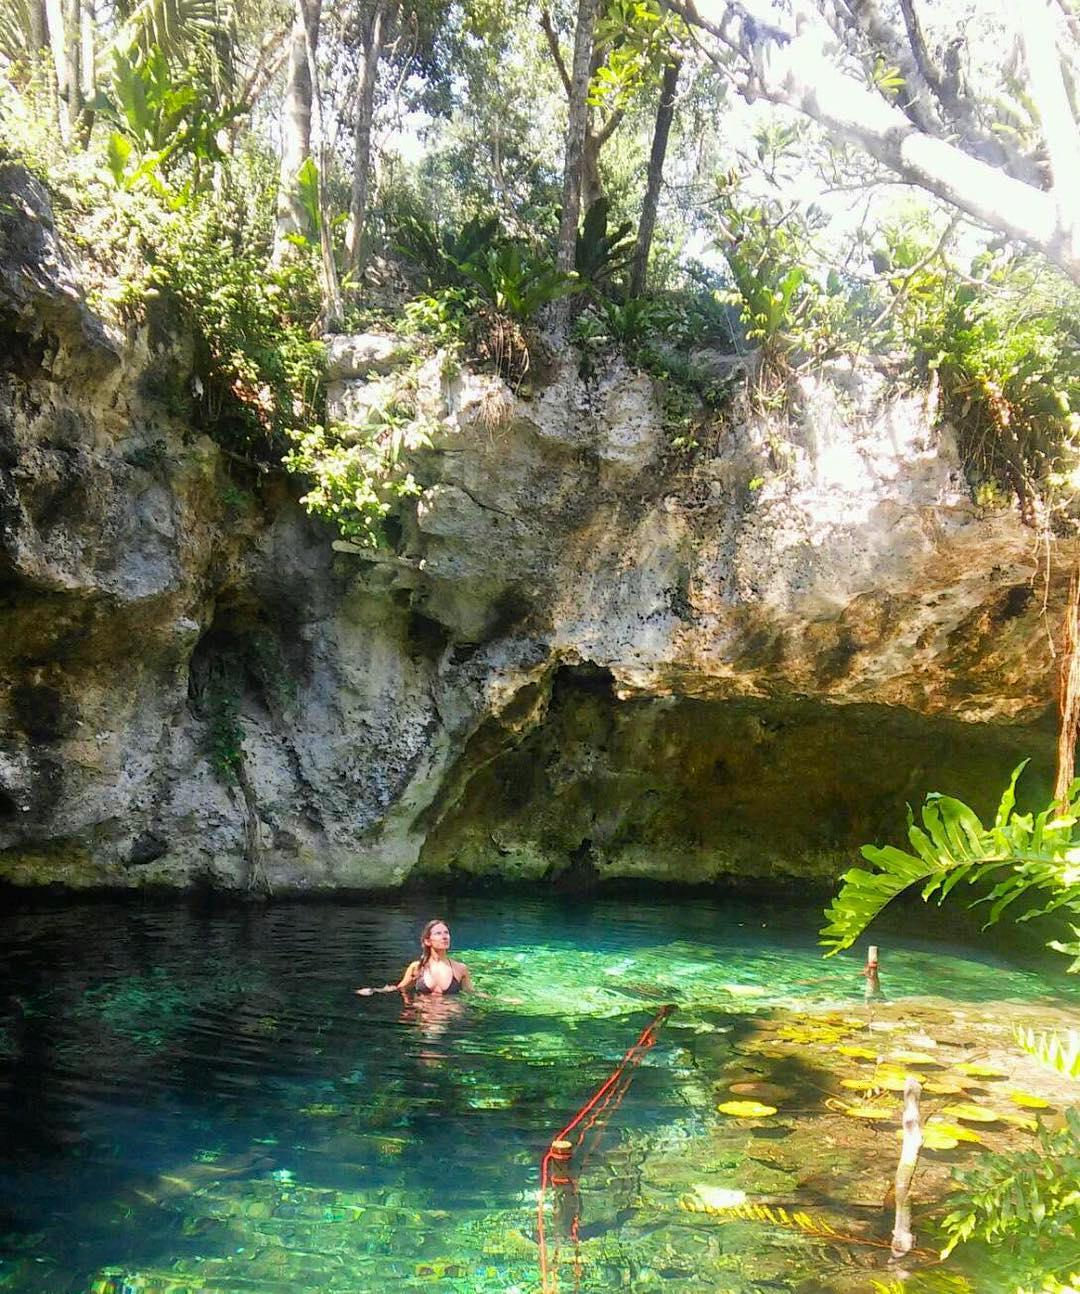 Adventured away from the beach today #cenote #Tulum #Mexico #wanderlust #adventureoften